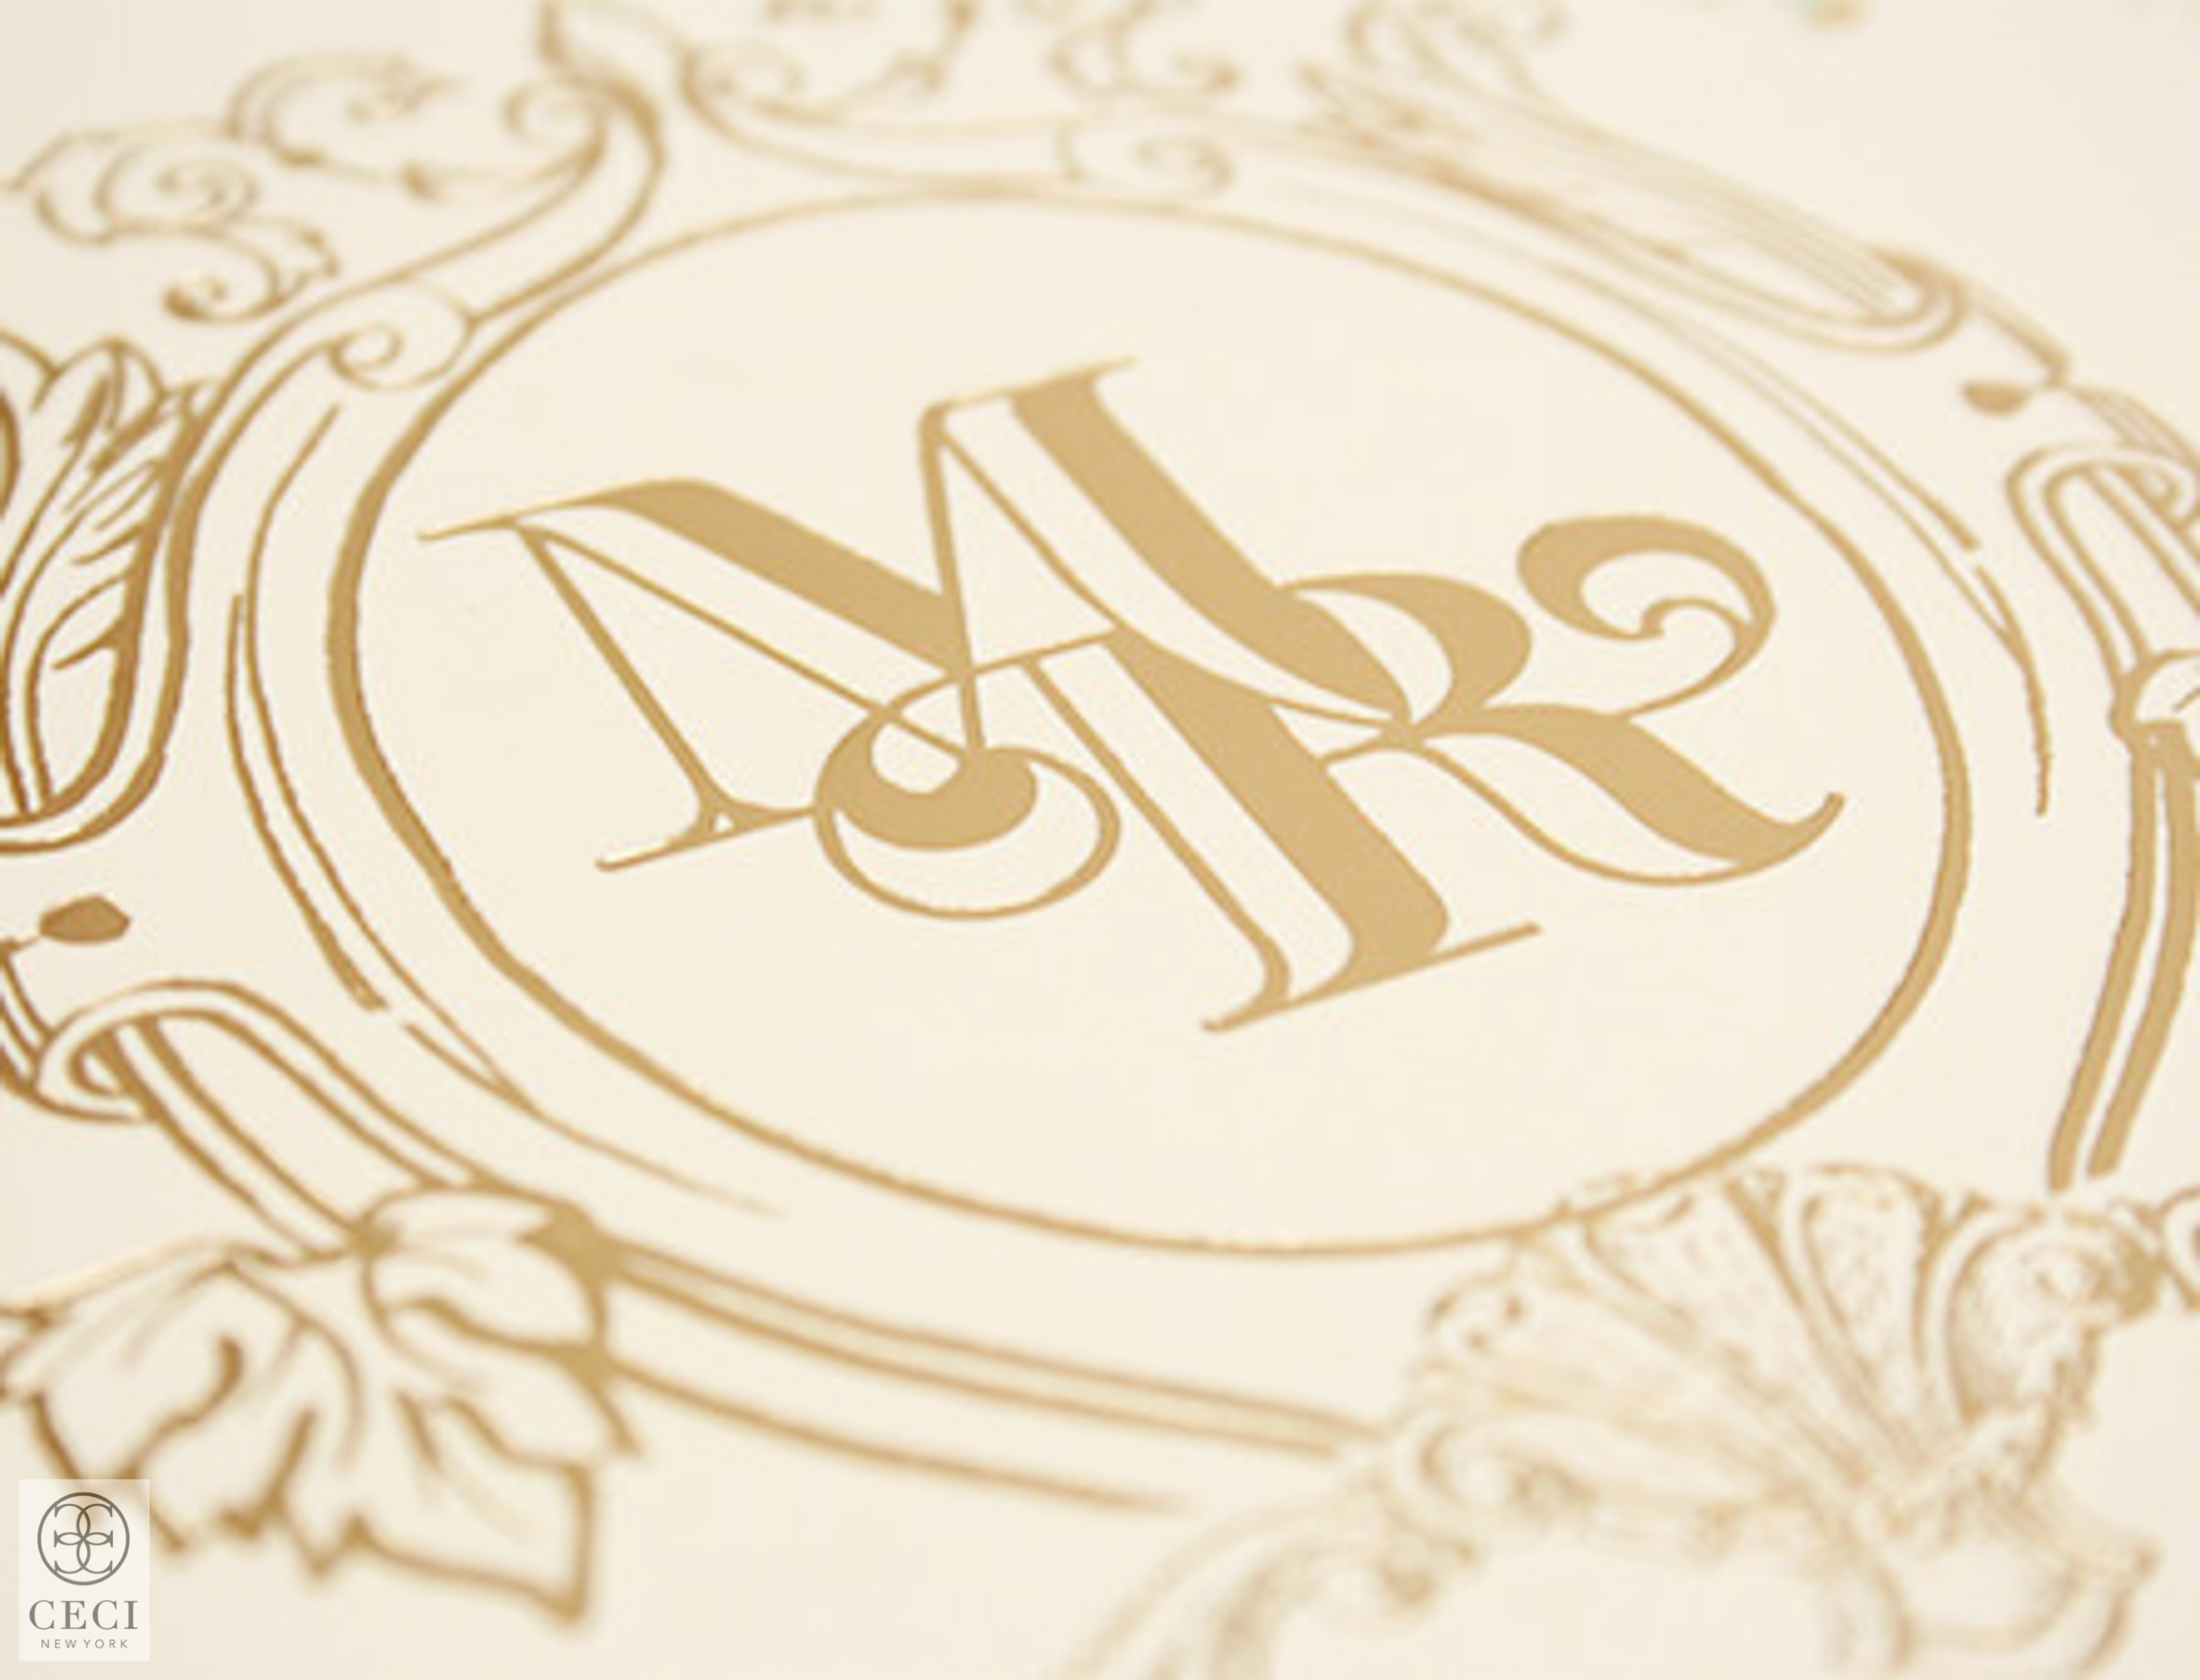 Ceci_New_York_Wedding_Lake_Como_Italy_Luxury_Style_Custom_Invitation-10.jpg